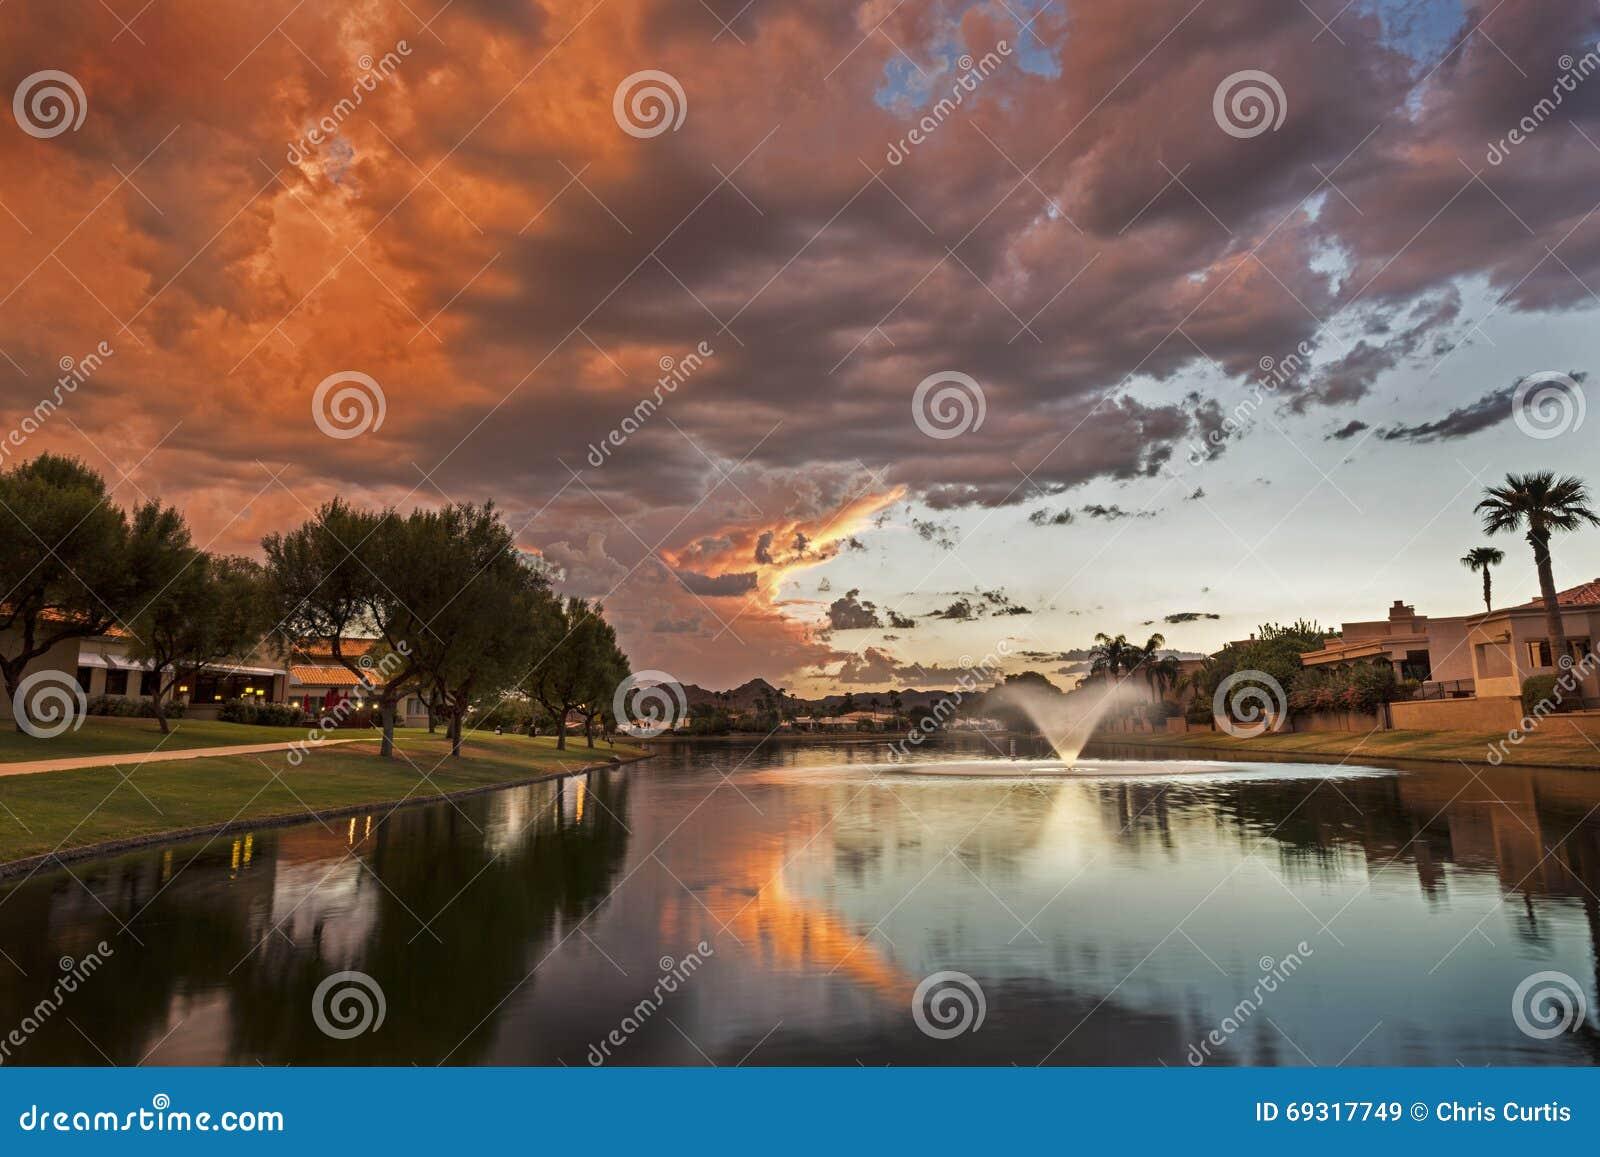 Marguerite lake in scottsdale arizona at sunset stock for Fishing license az price